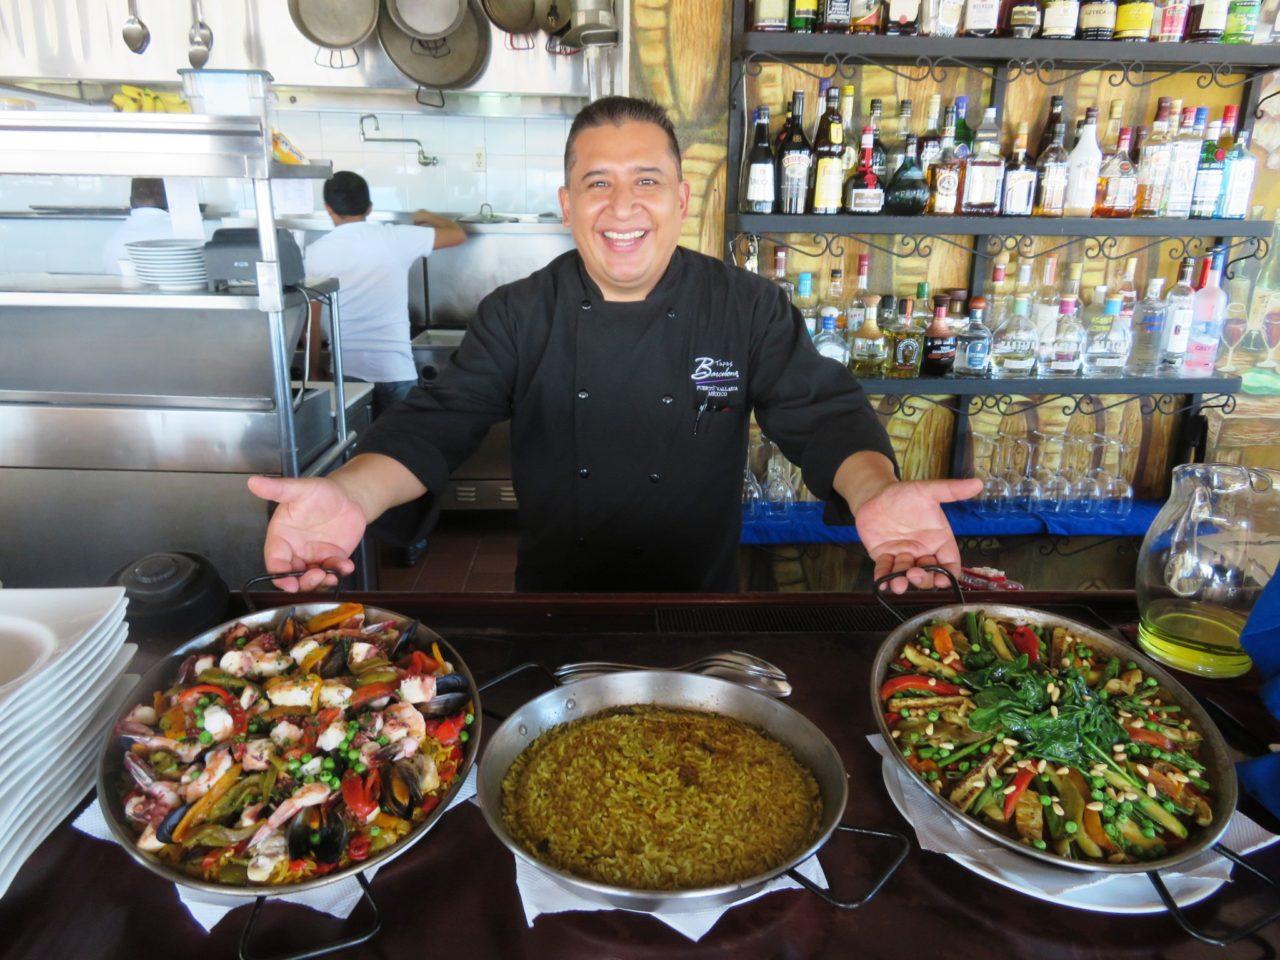 Puerto Vallarta Favorite Experiences : Paella at the Barcelona Tapas Restaurant